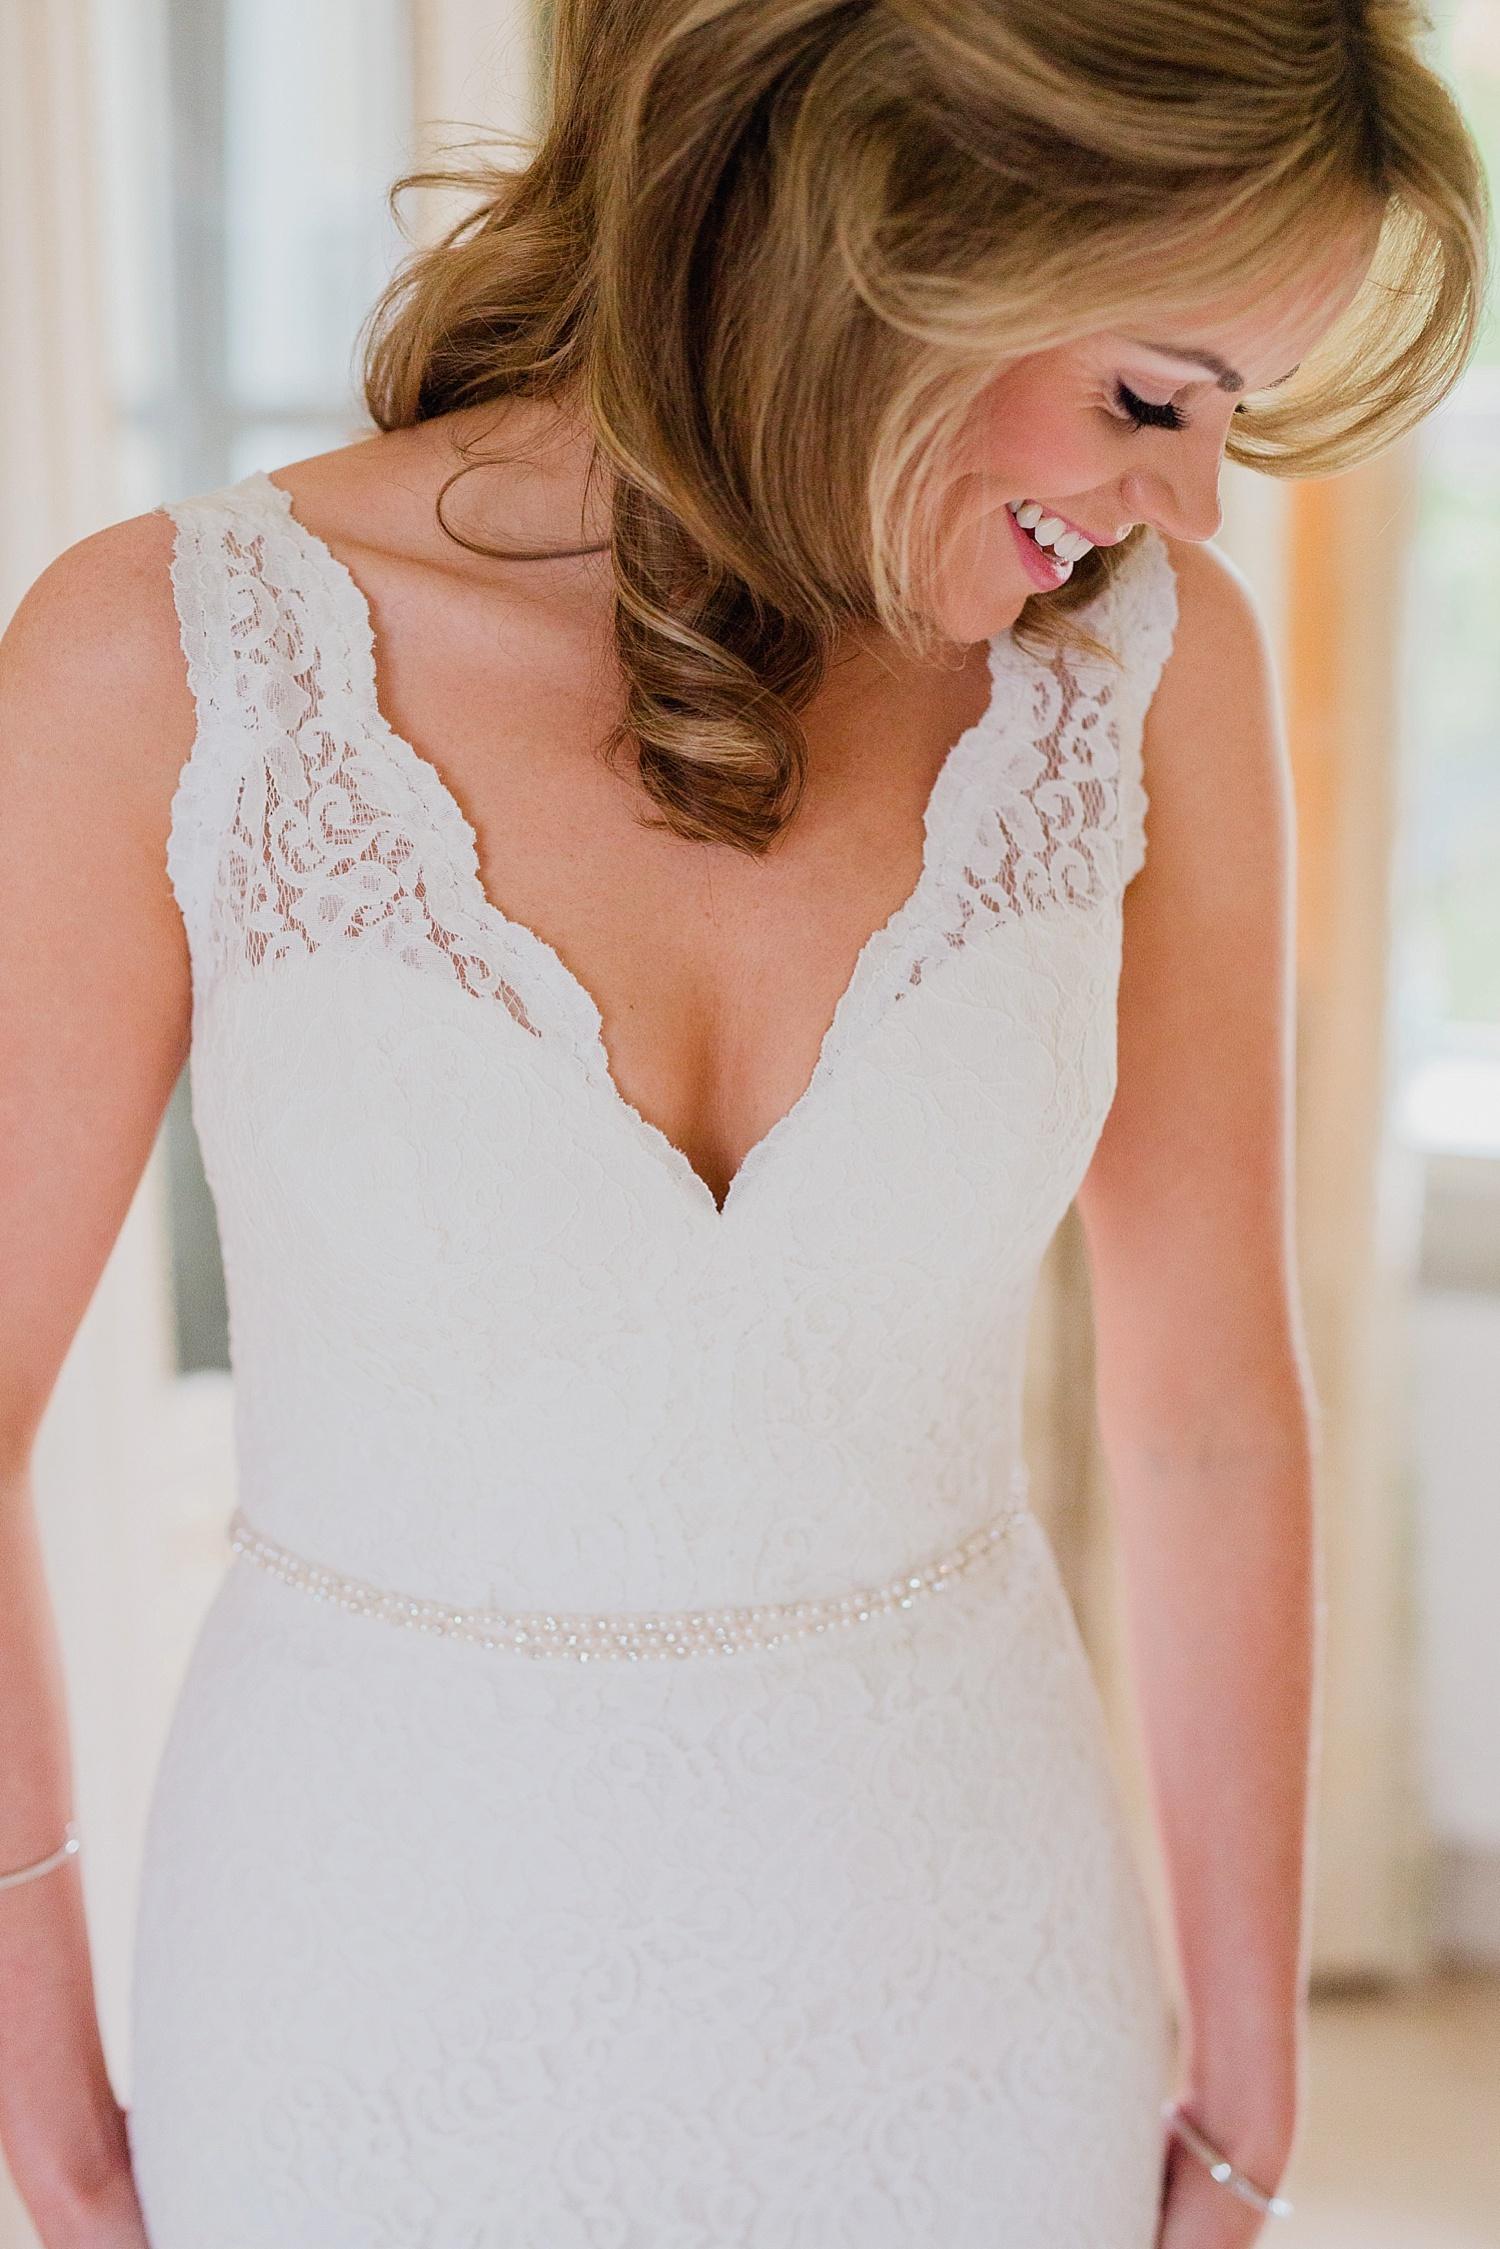 ashford_lodge_wedding-ashford_castle_wedding-best_of_2016_sharon_kee_photography_0110